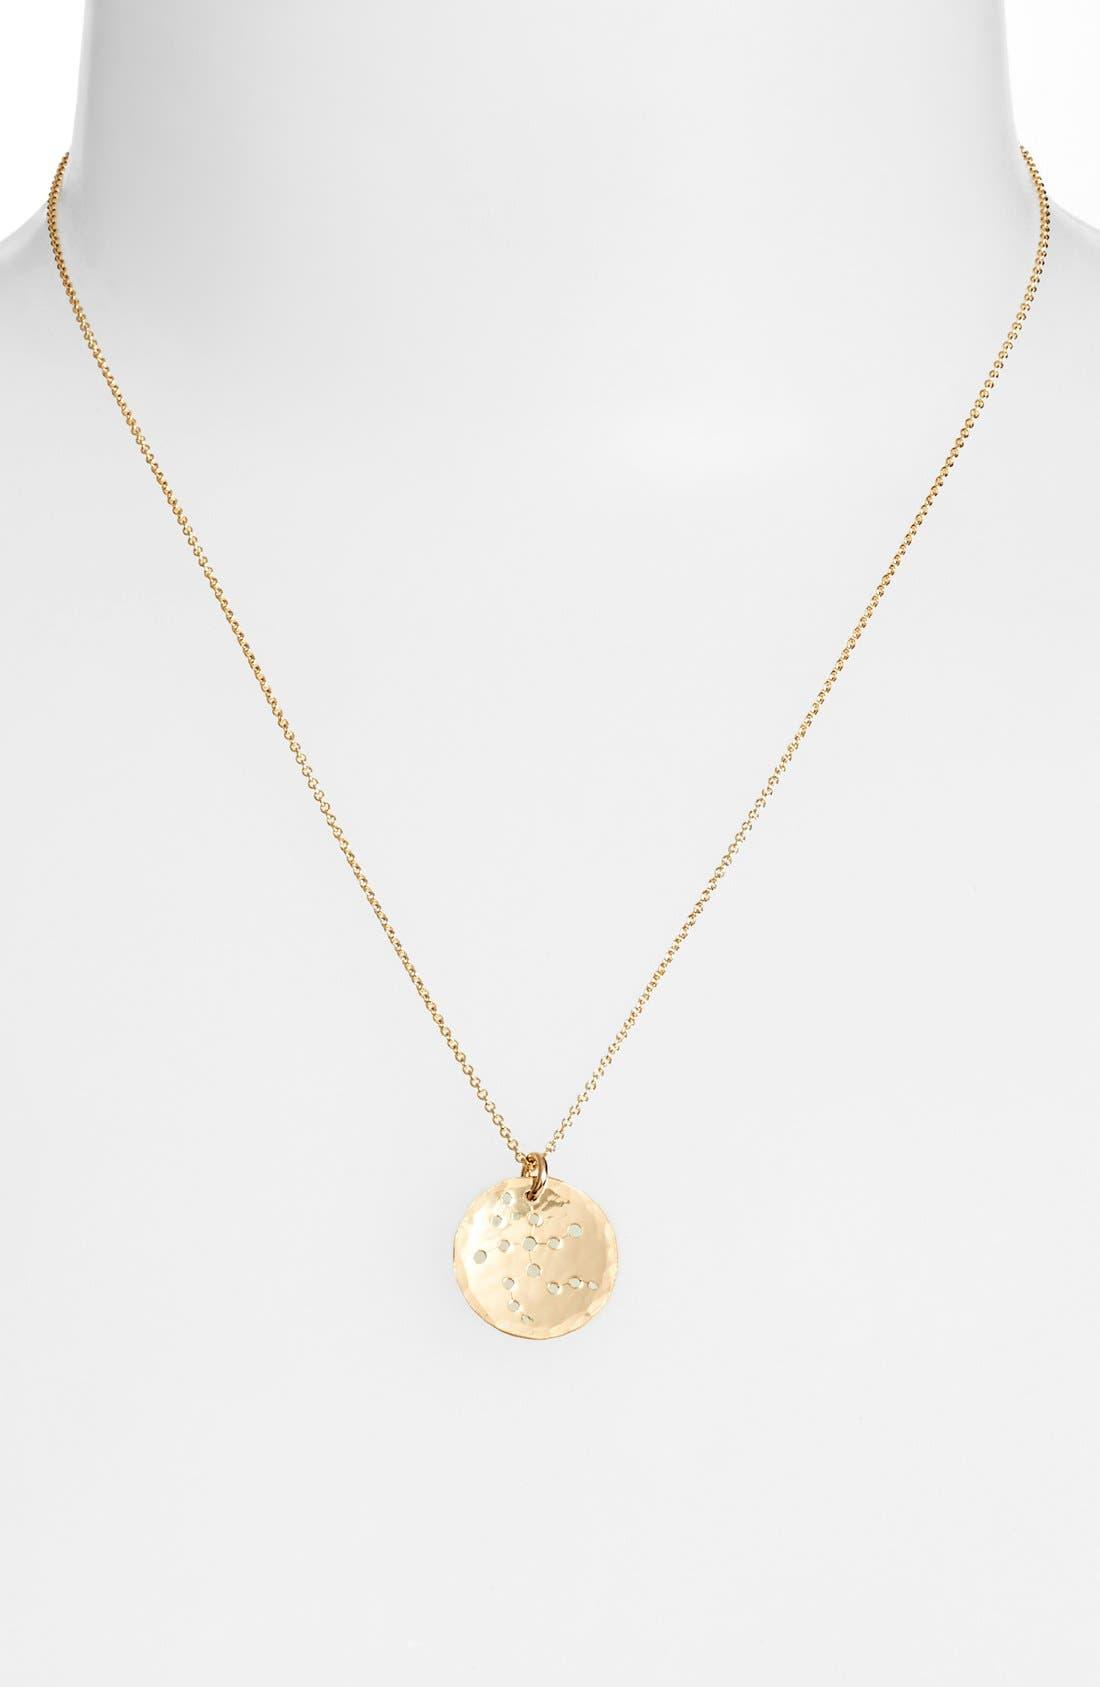 Ija 'Small Zodiac' 14k-Gold Fill Necklace,                             Alternate thumbnail 18, color,